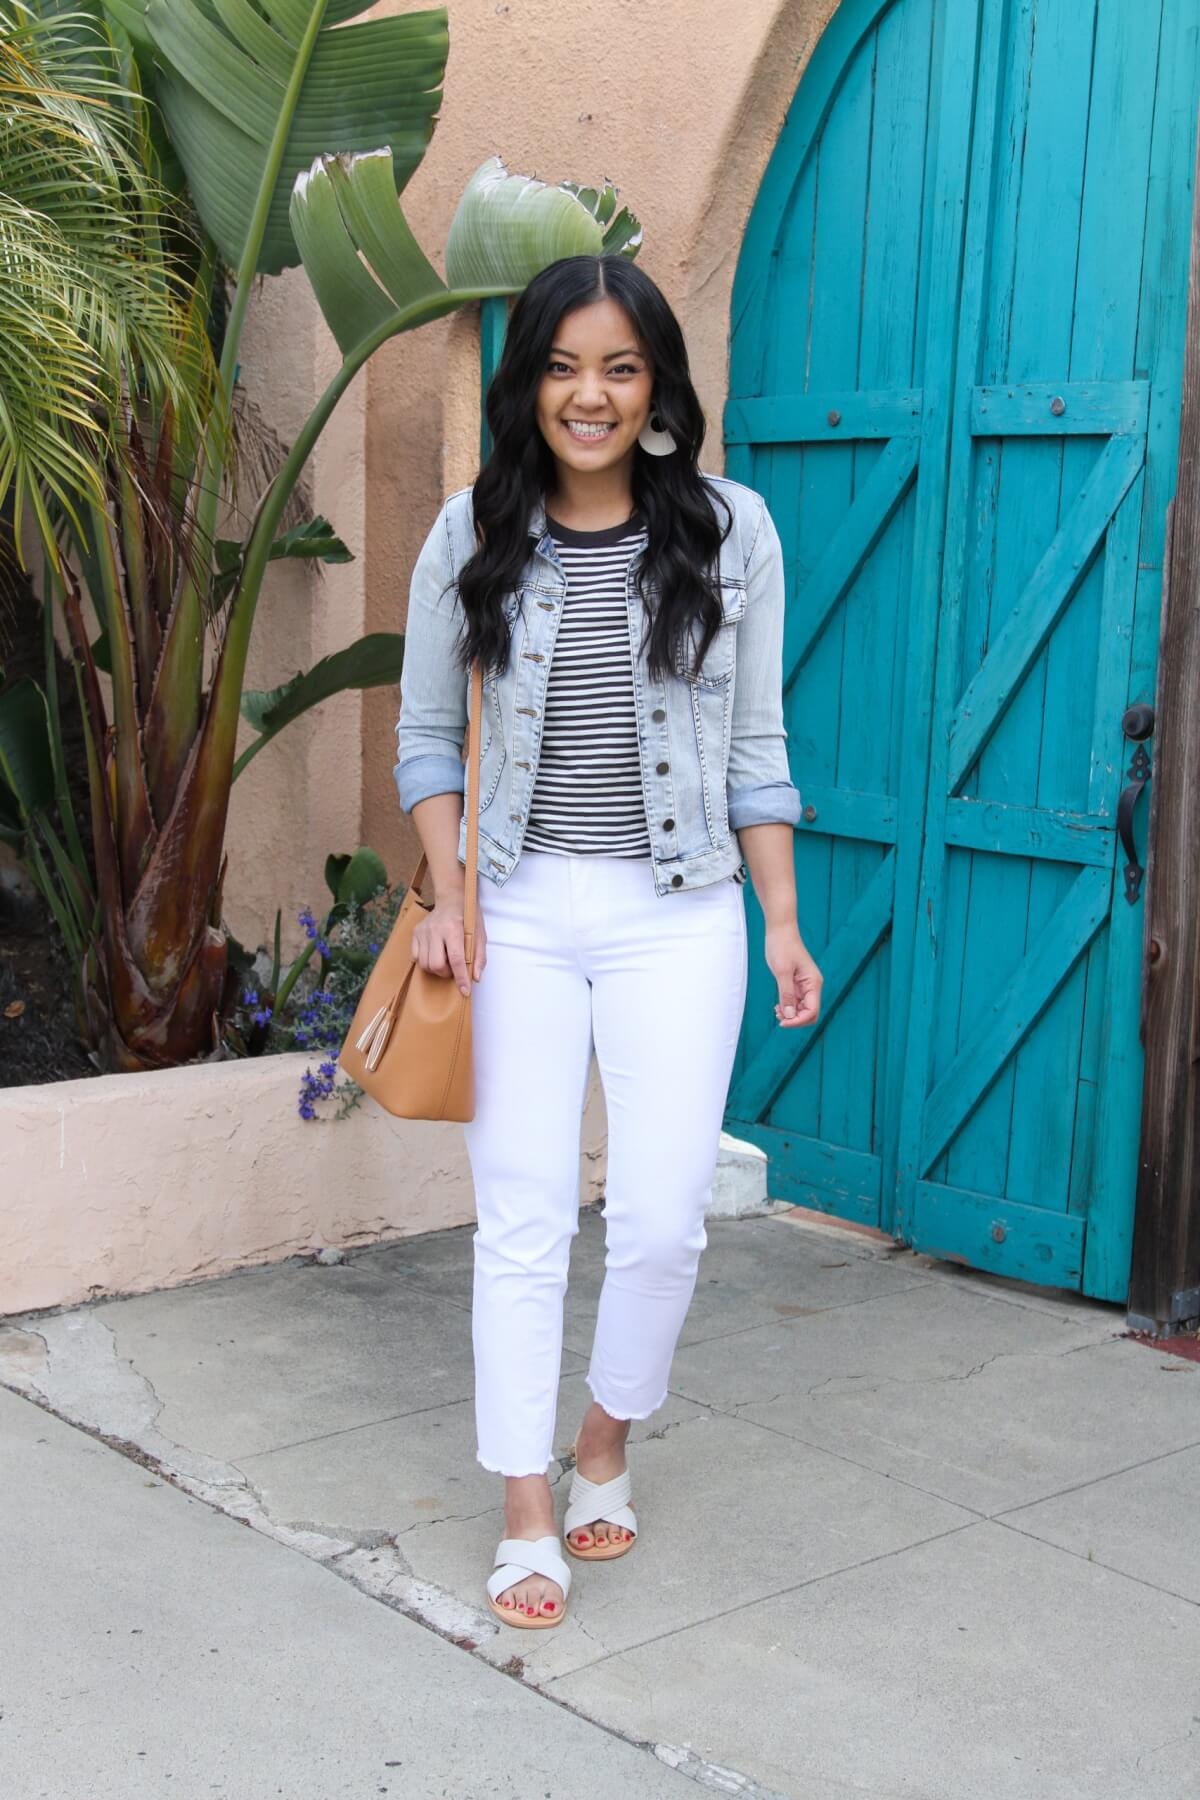 Easy to Wear Shoes for Spring: DV by Dolce Vita Lyra white slides + Madewell black and white striped tee + white straight leg jeans + denim jacket + white earrings + tan bag